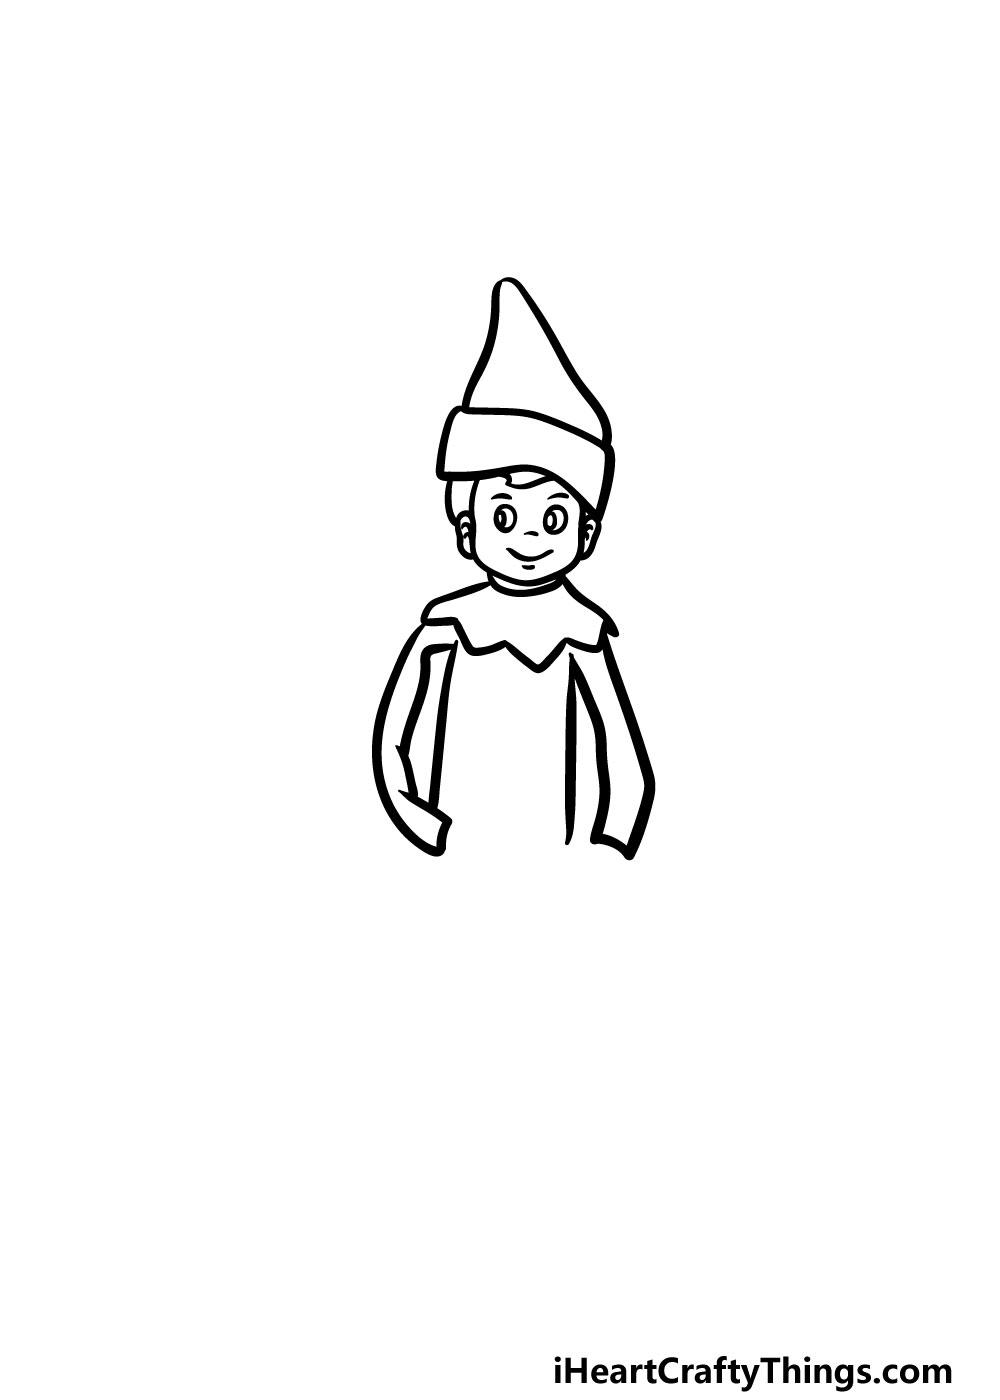 drawing an elf on a shelf step 4